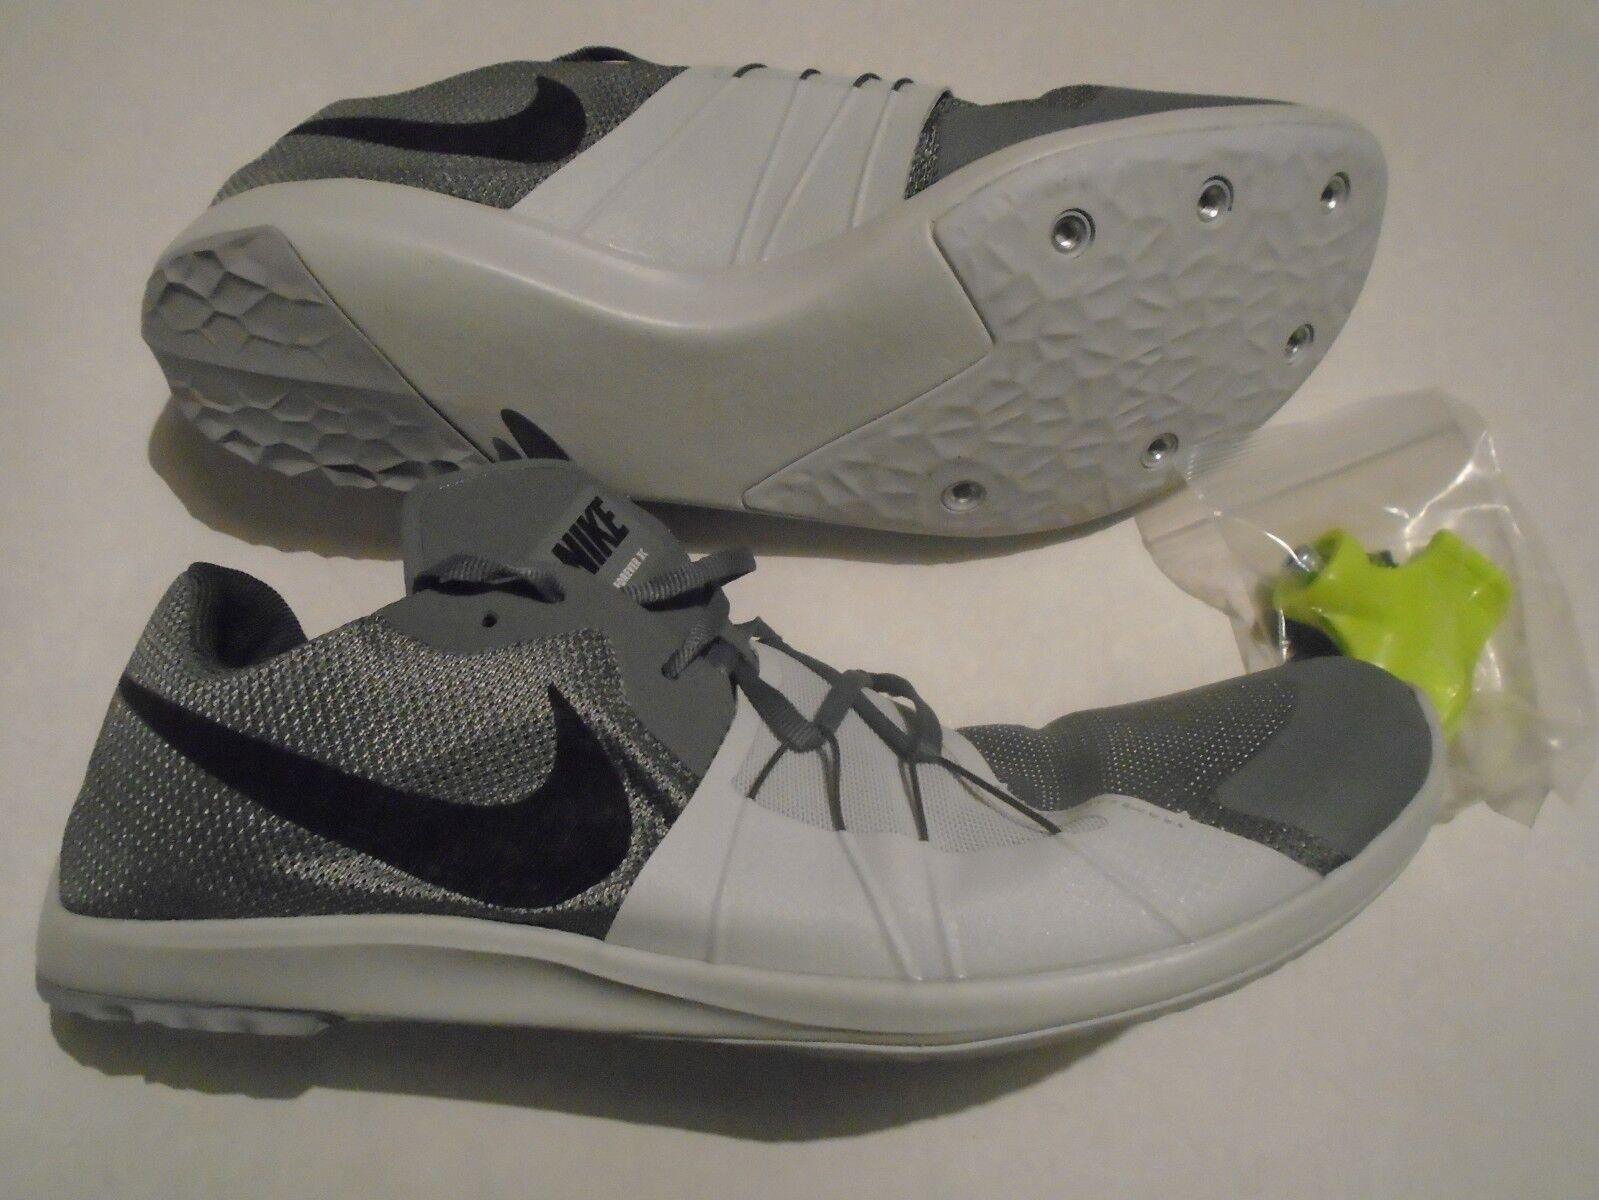 Hot Sale Men's Retro Basketball Badminton Shoes Tennis High Top Sneakers Shoes Badminton Fashion e81afb